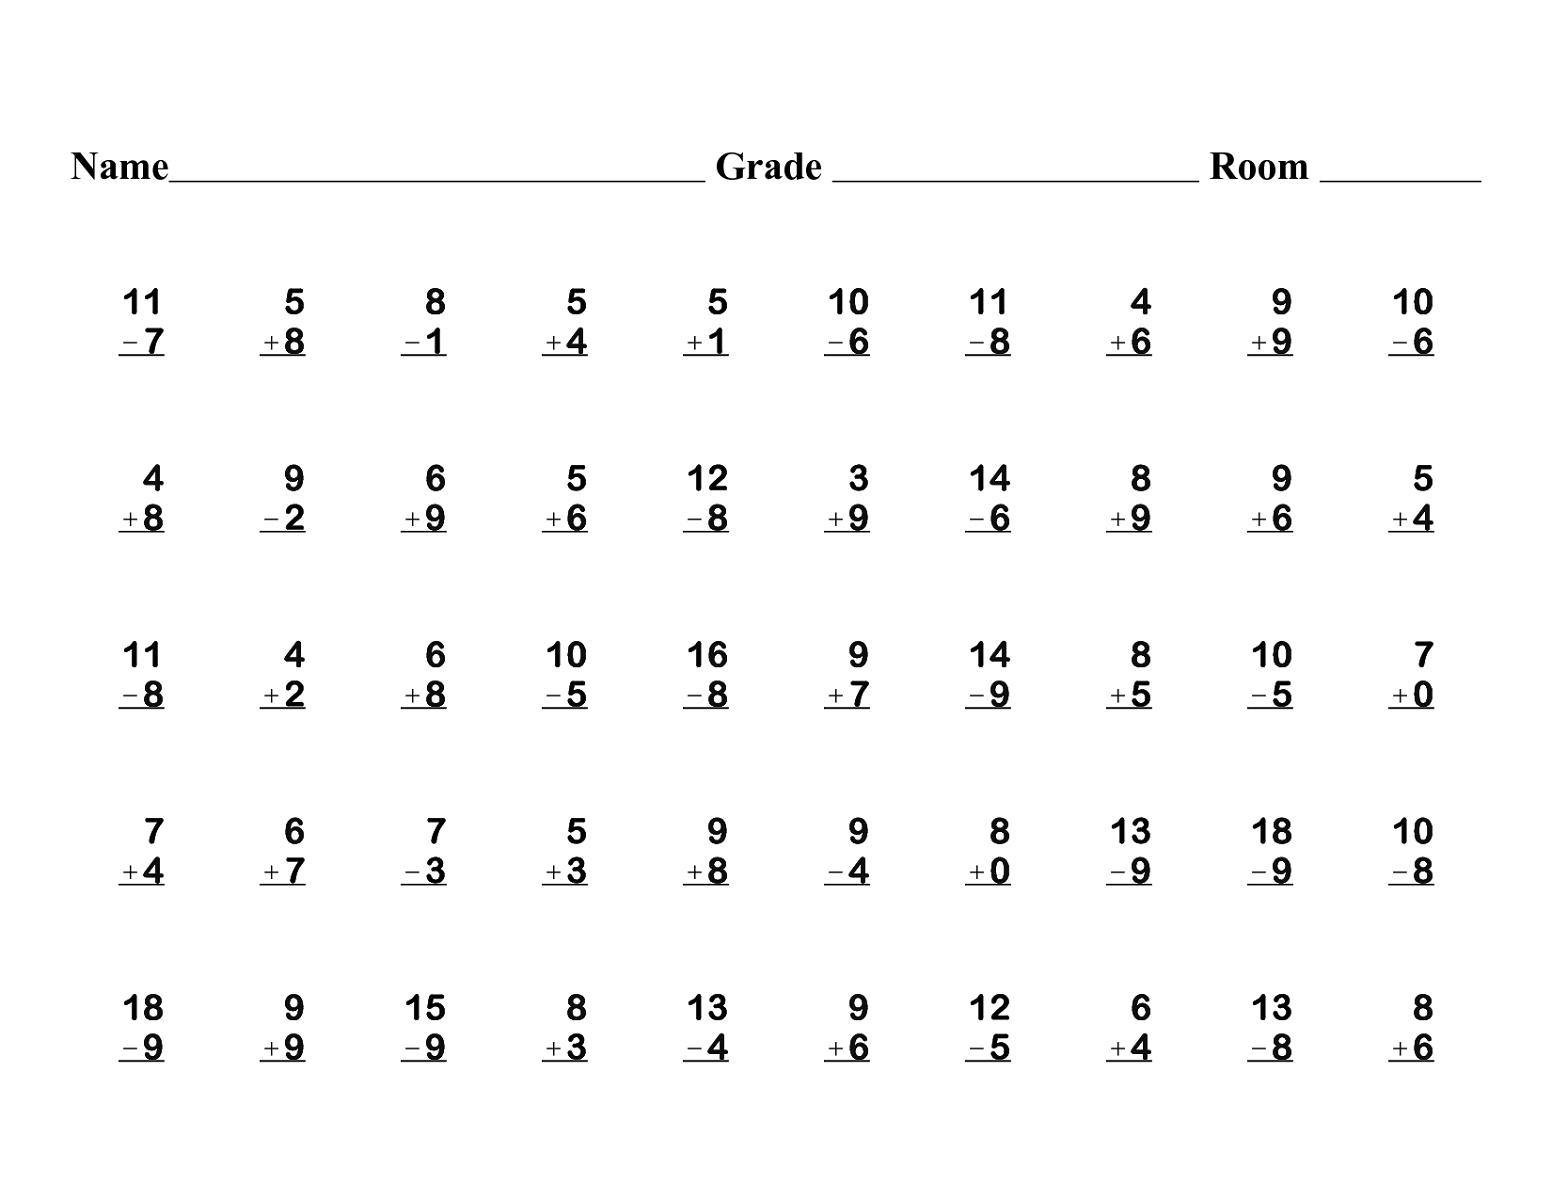 maths worksheets for grade 1 download 1st grade math worksheets free loving printable download worksheets for maths grade 1